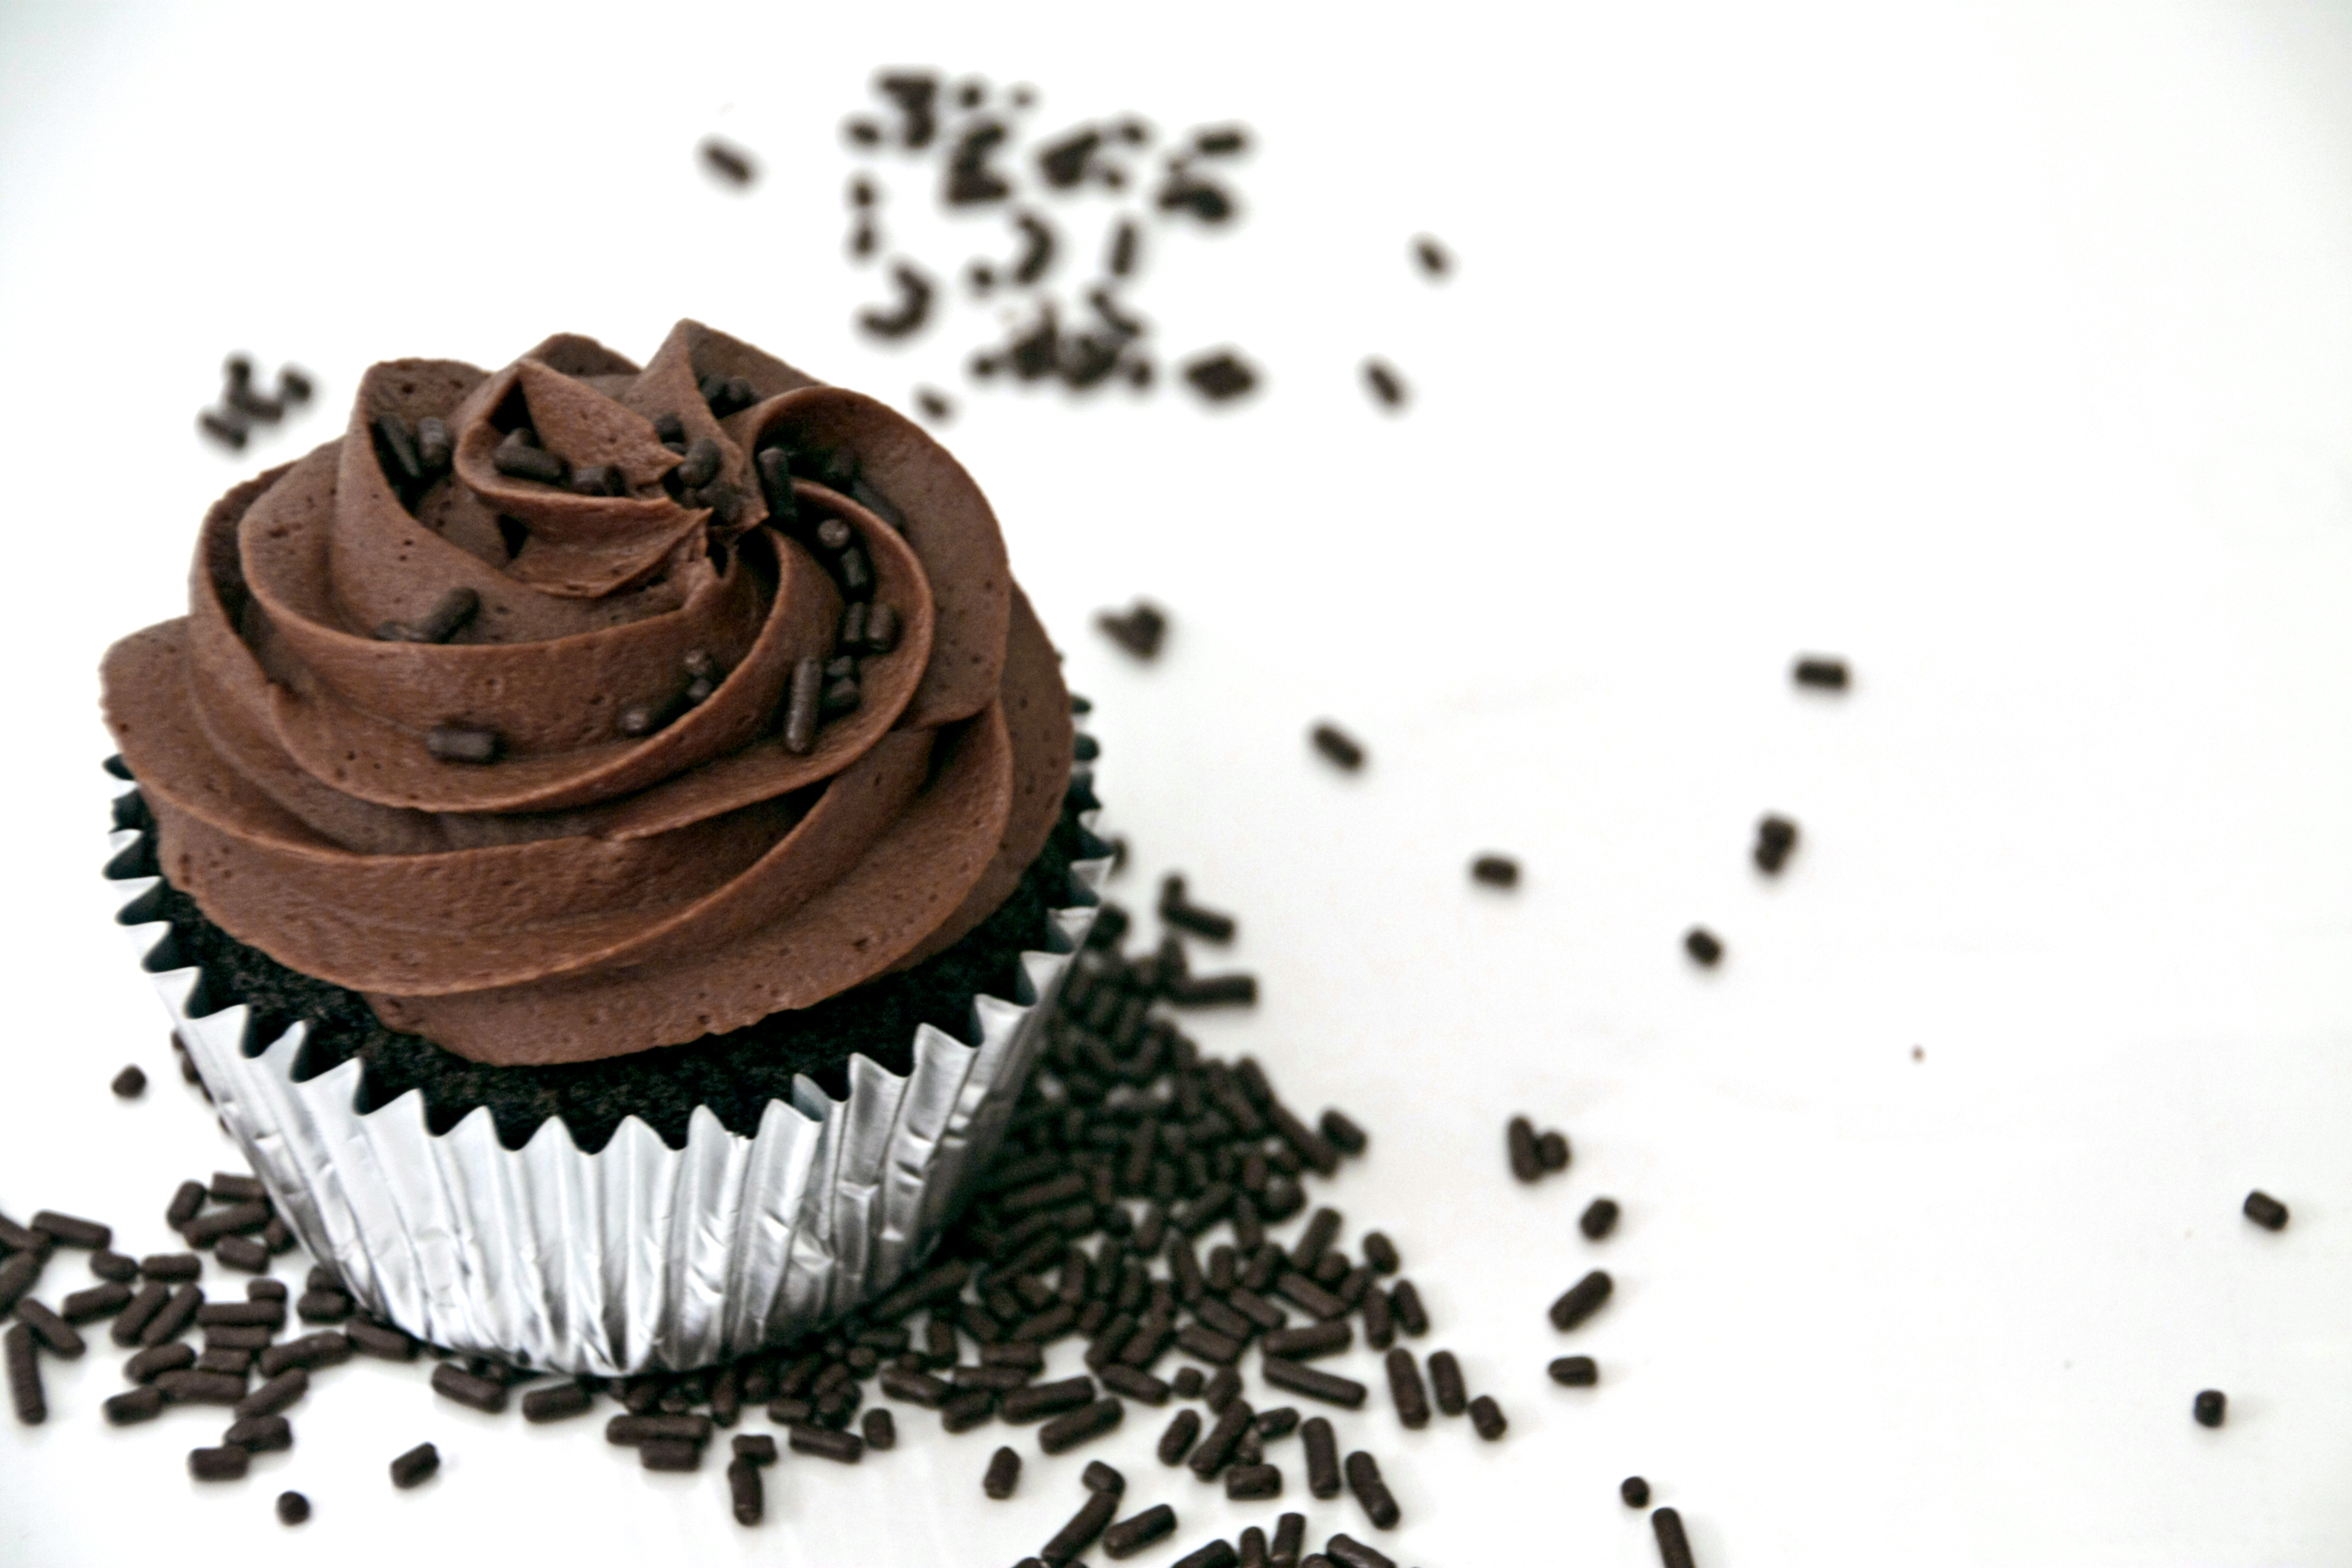 cupcake-CHOCOLATE-08 03 13_2784